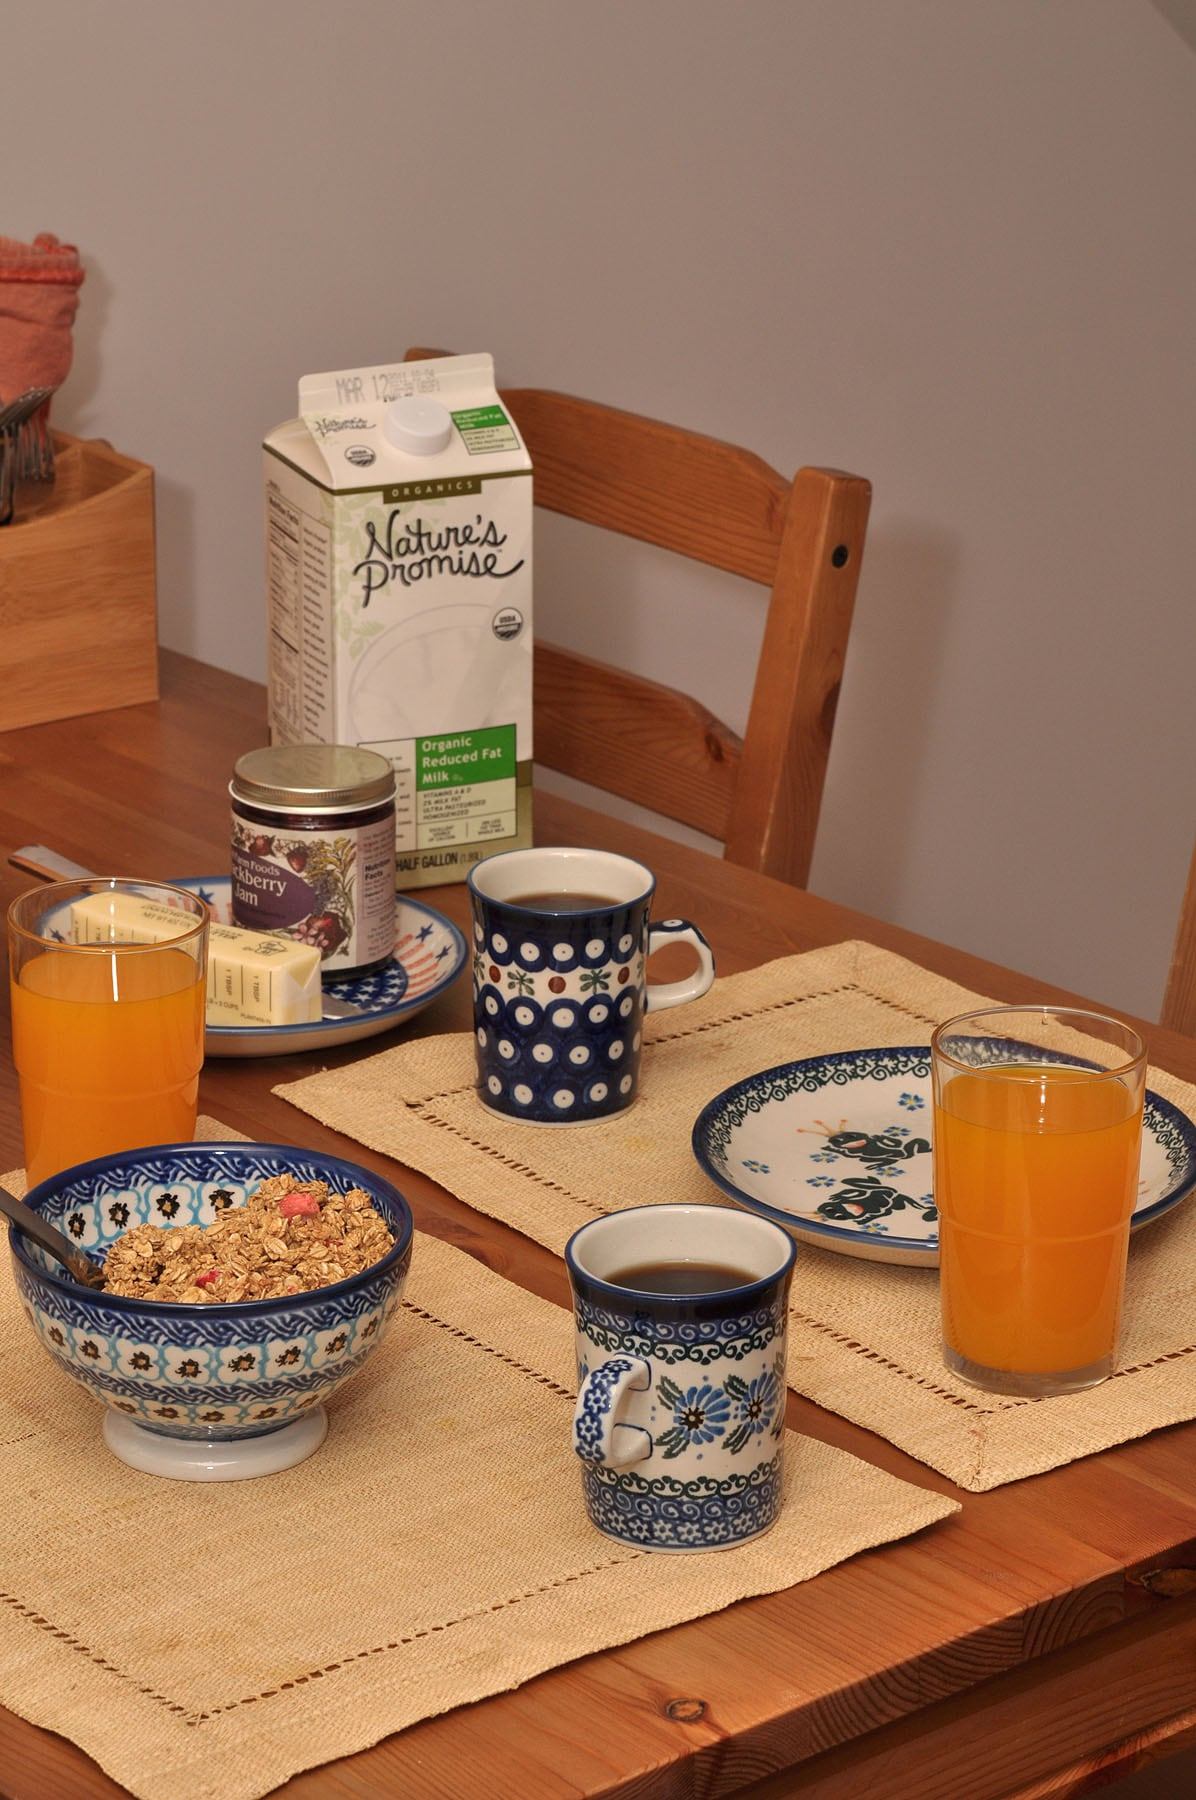 Enjoy self-service organic, fair trade continental breakfast in your room.